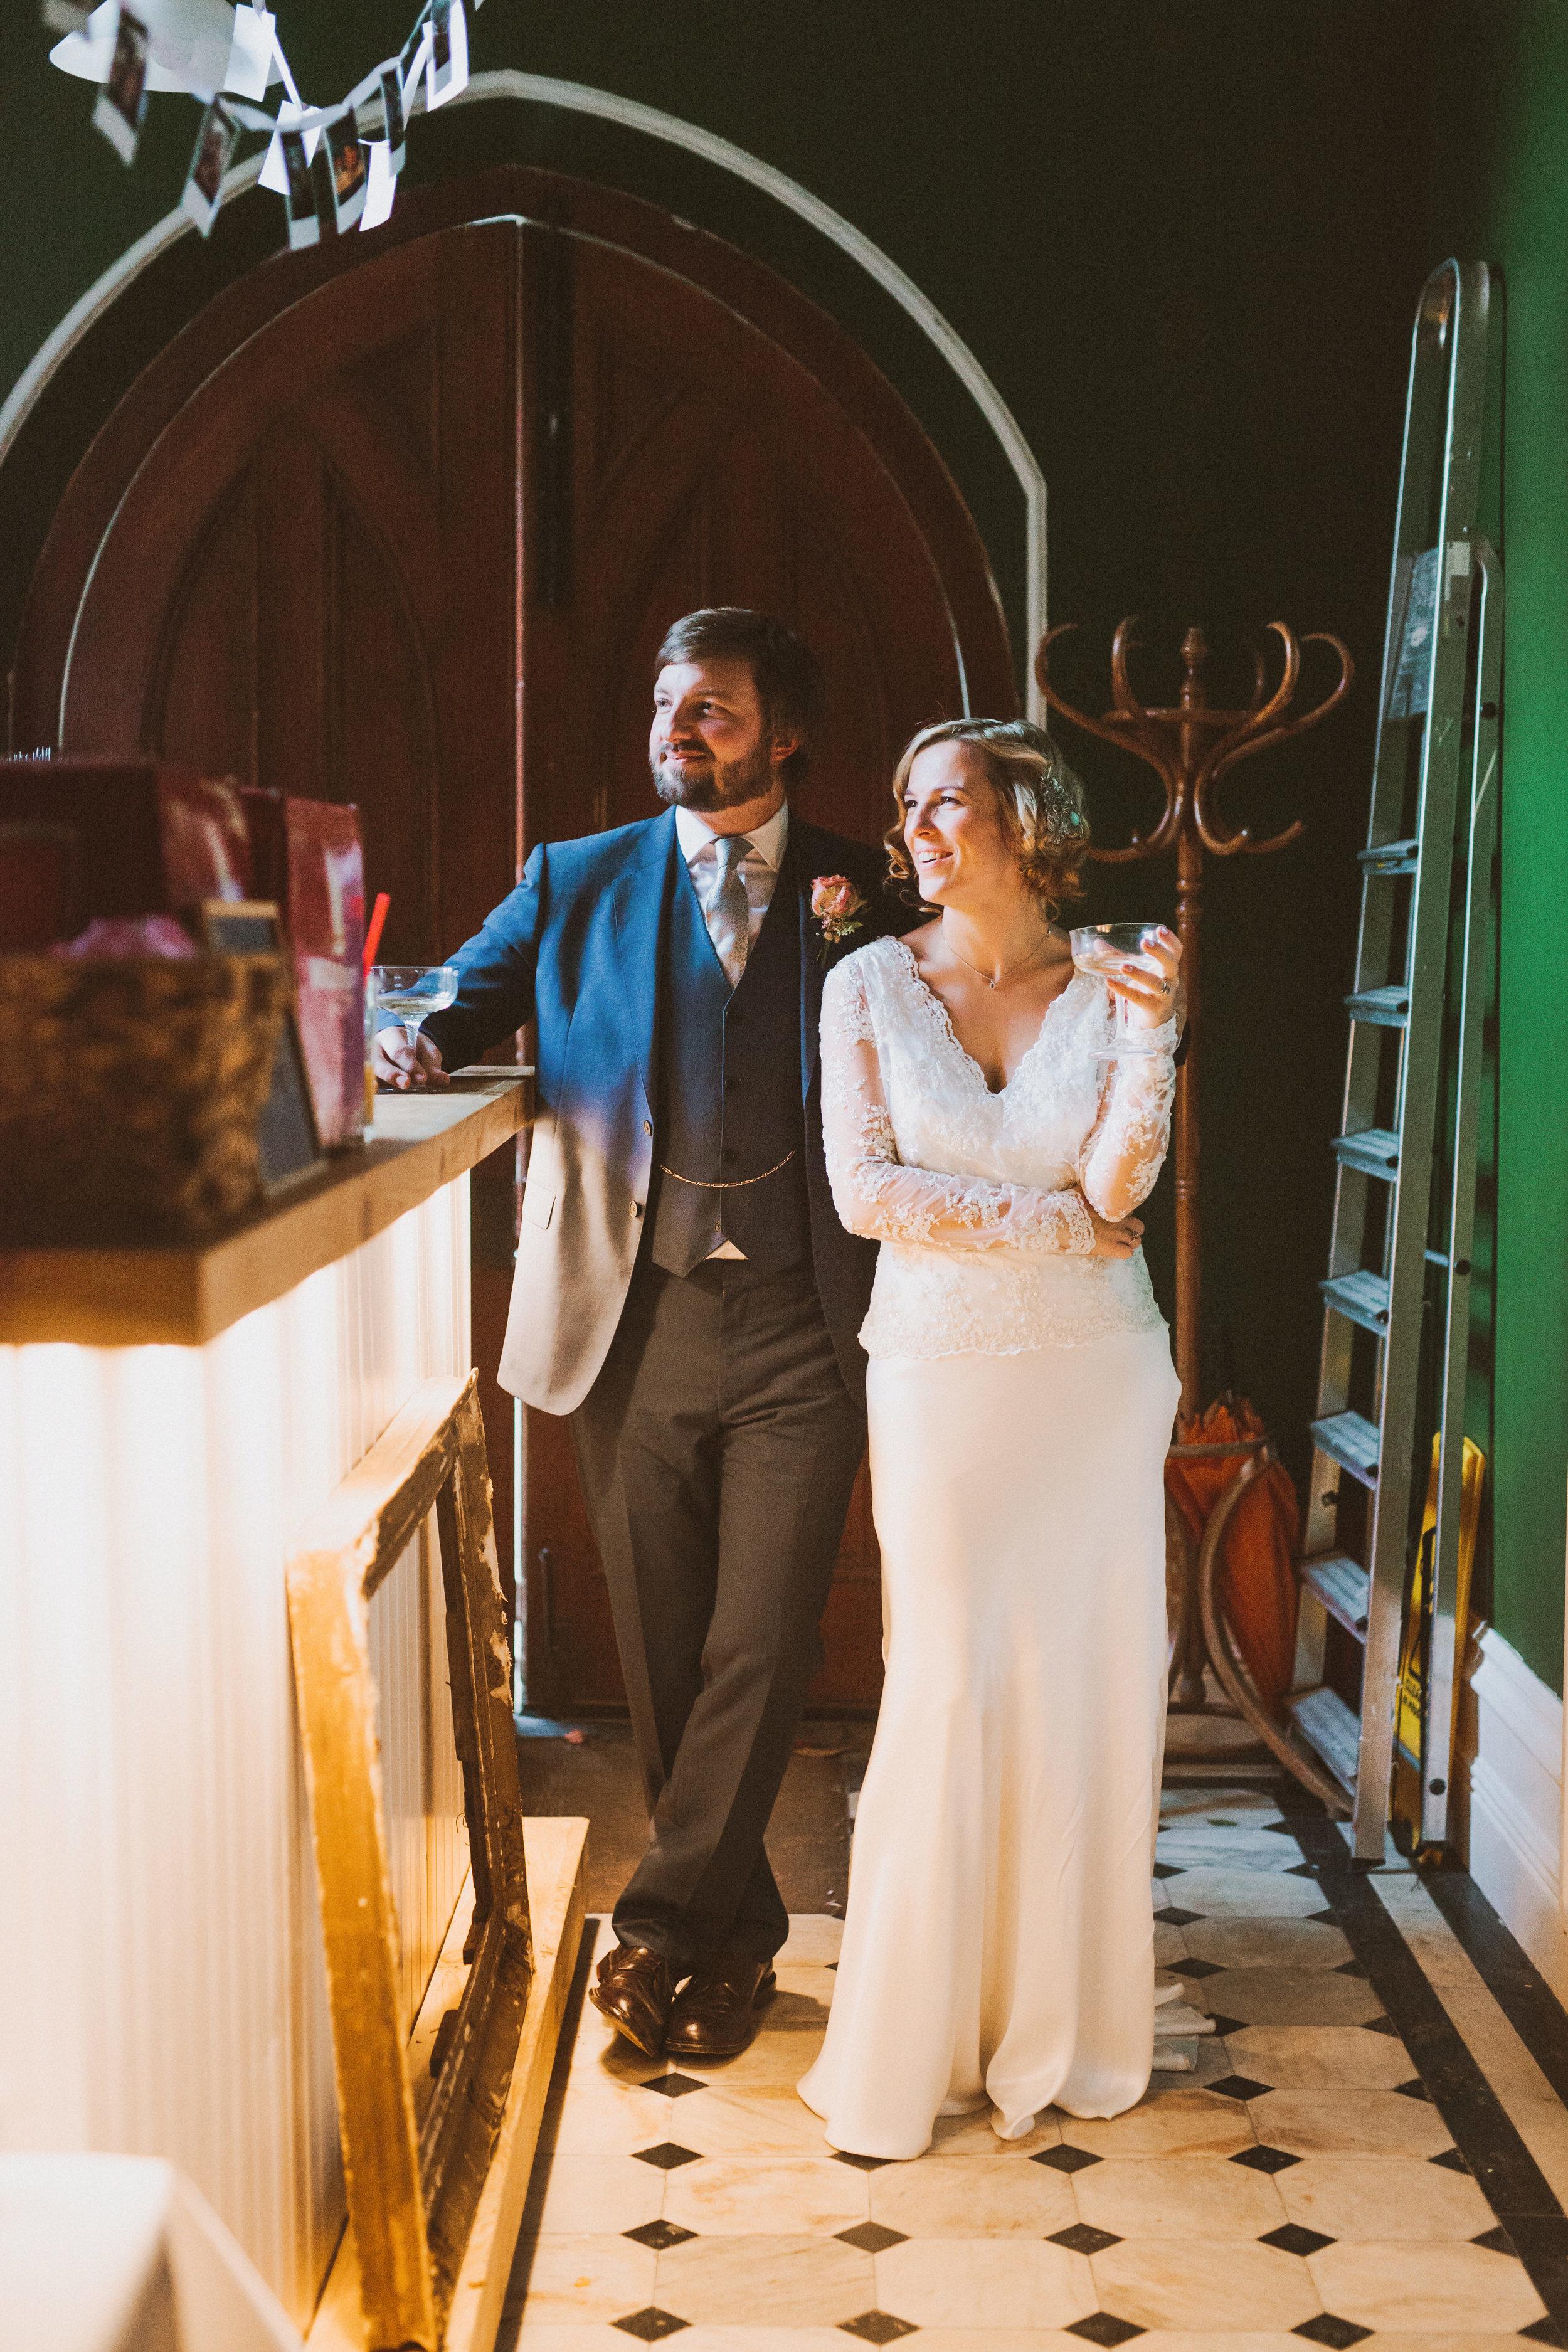 Jo-Peak-District-Autumn-Wedding-Bespoke-Vintage-Bias-Wedding-Gown-Lace-Jacket-Susanna-Greening-Matlock-14